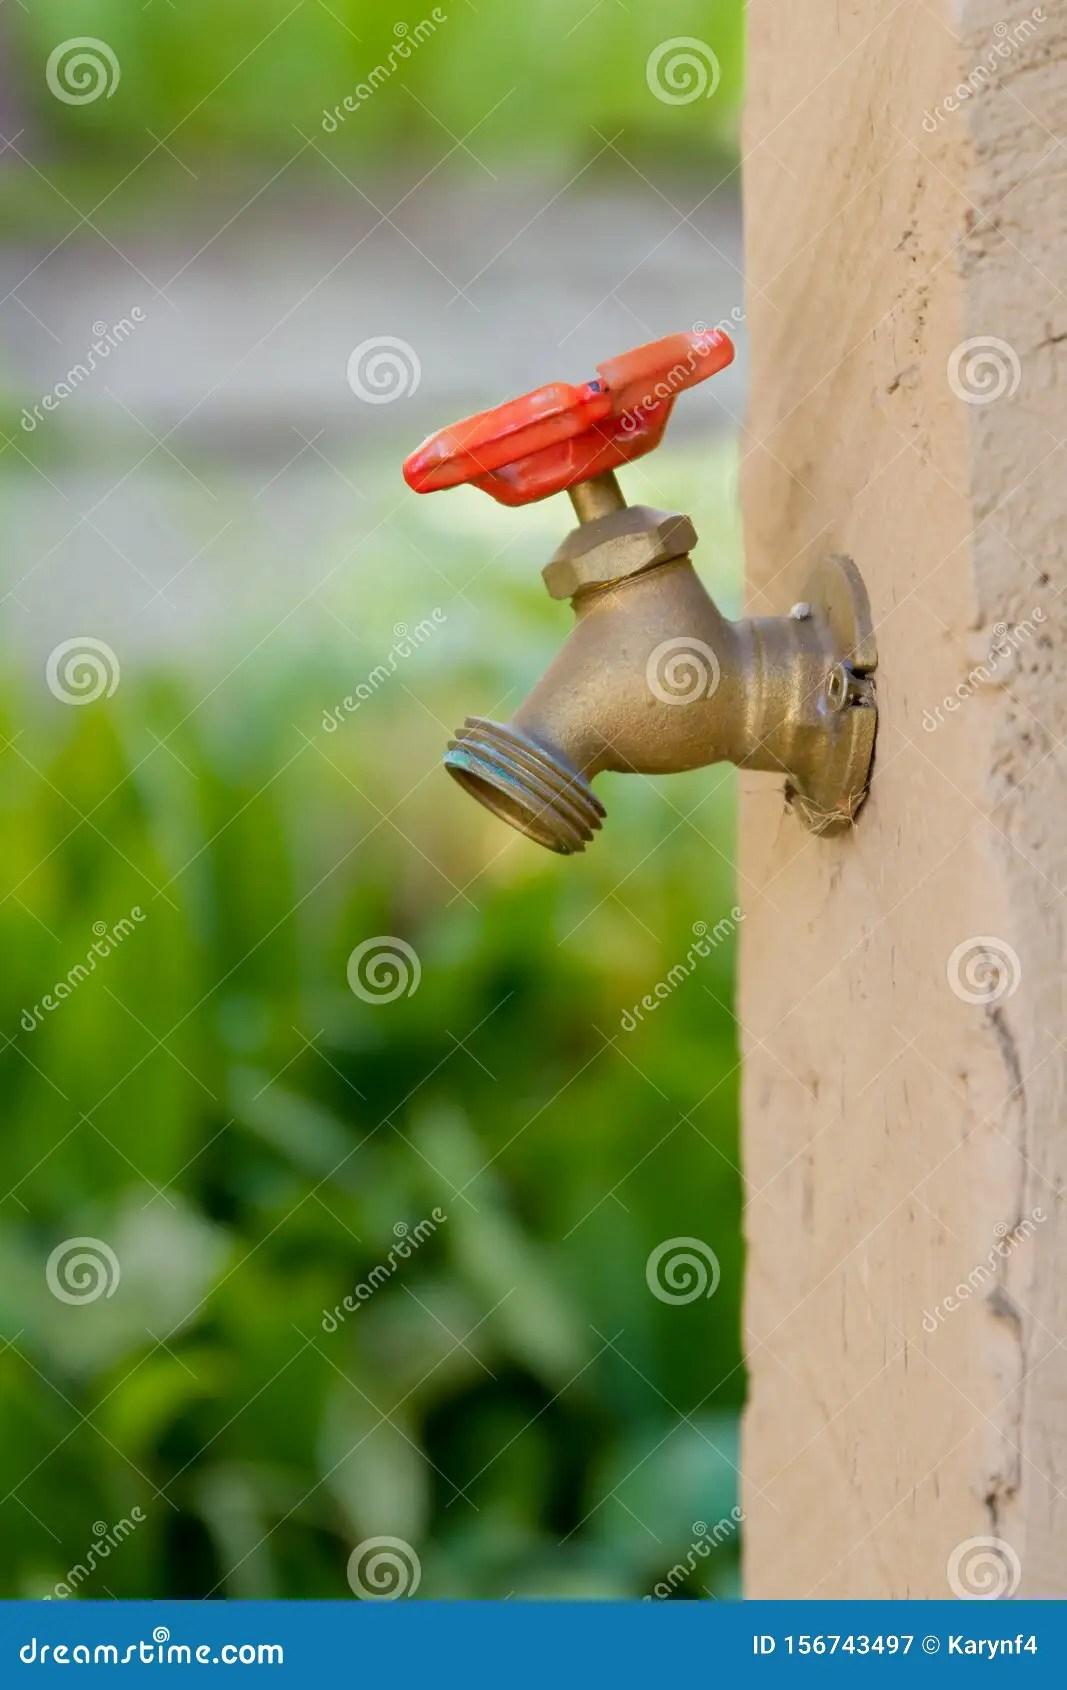 https www dreamstime com outdoor tap to water dry gardens off garden outdoor faucet red handle image156743497